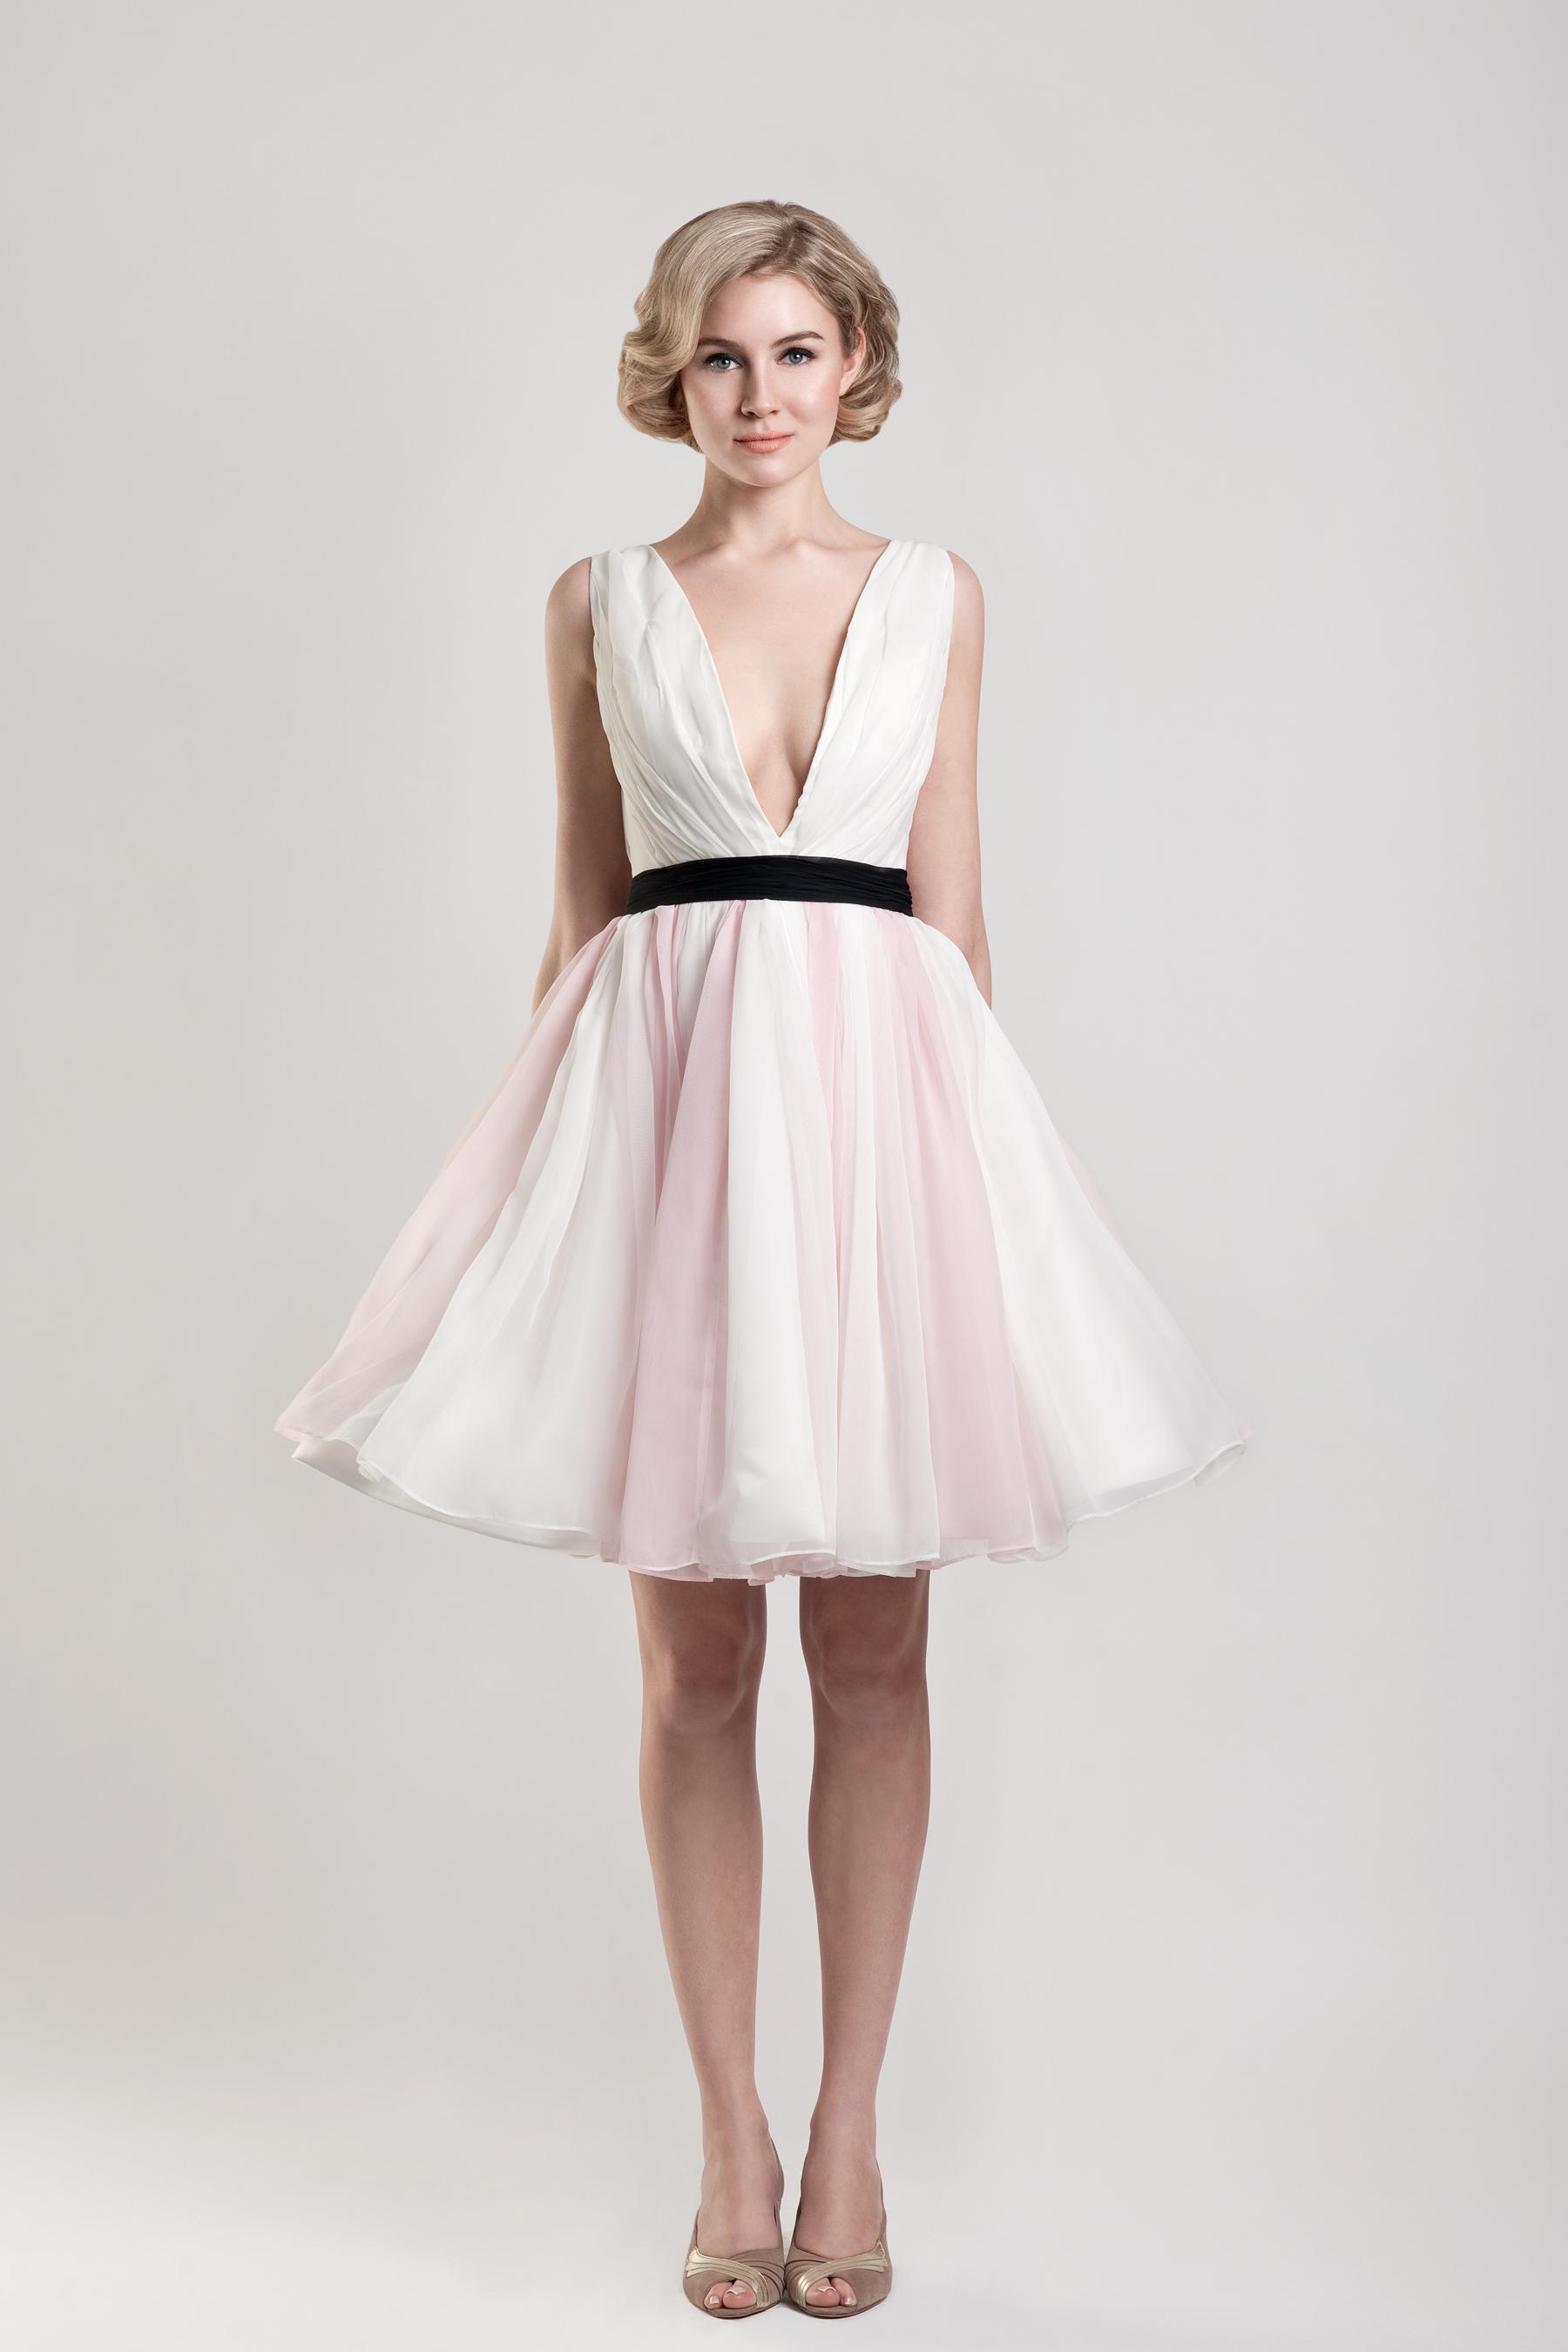 Vintage Replica Dresses